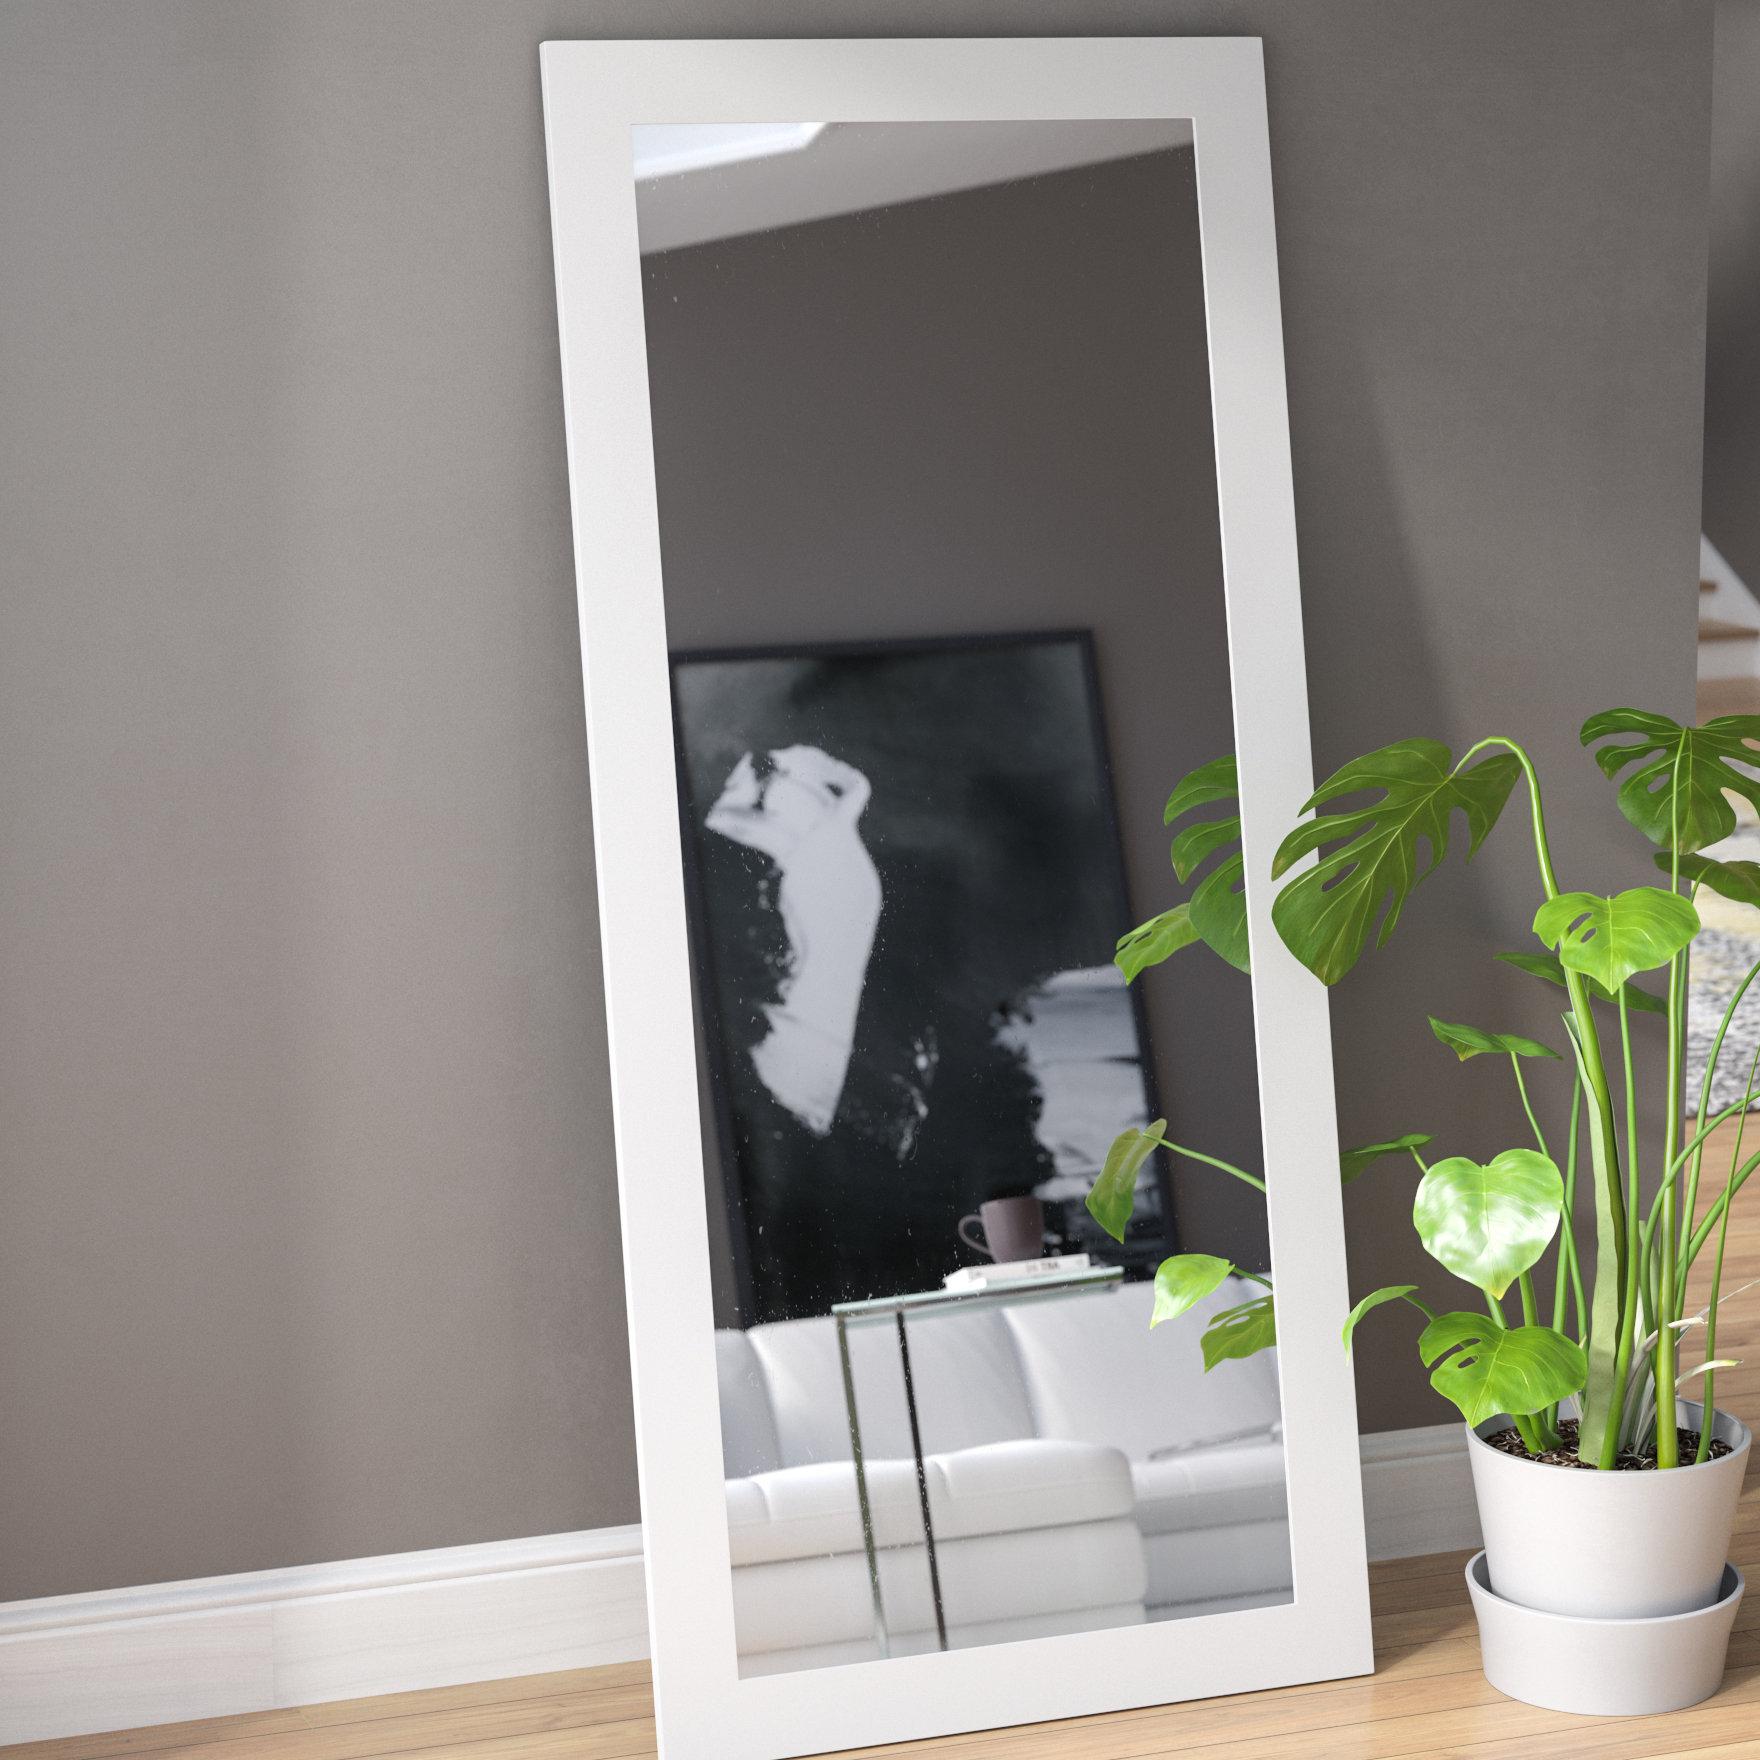 Orren Ellis Polzin Full Length Mirror & Reviews | Wayfair Inside Dalessio Wide Tall Full Length Mirrors (Image 17 of 20)